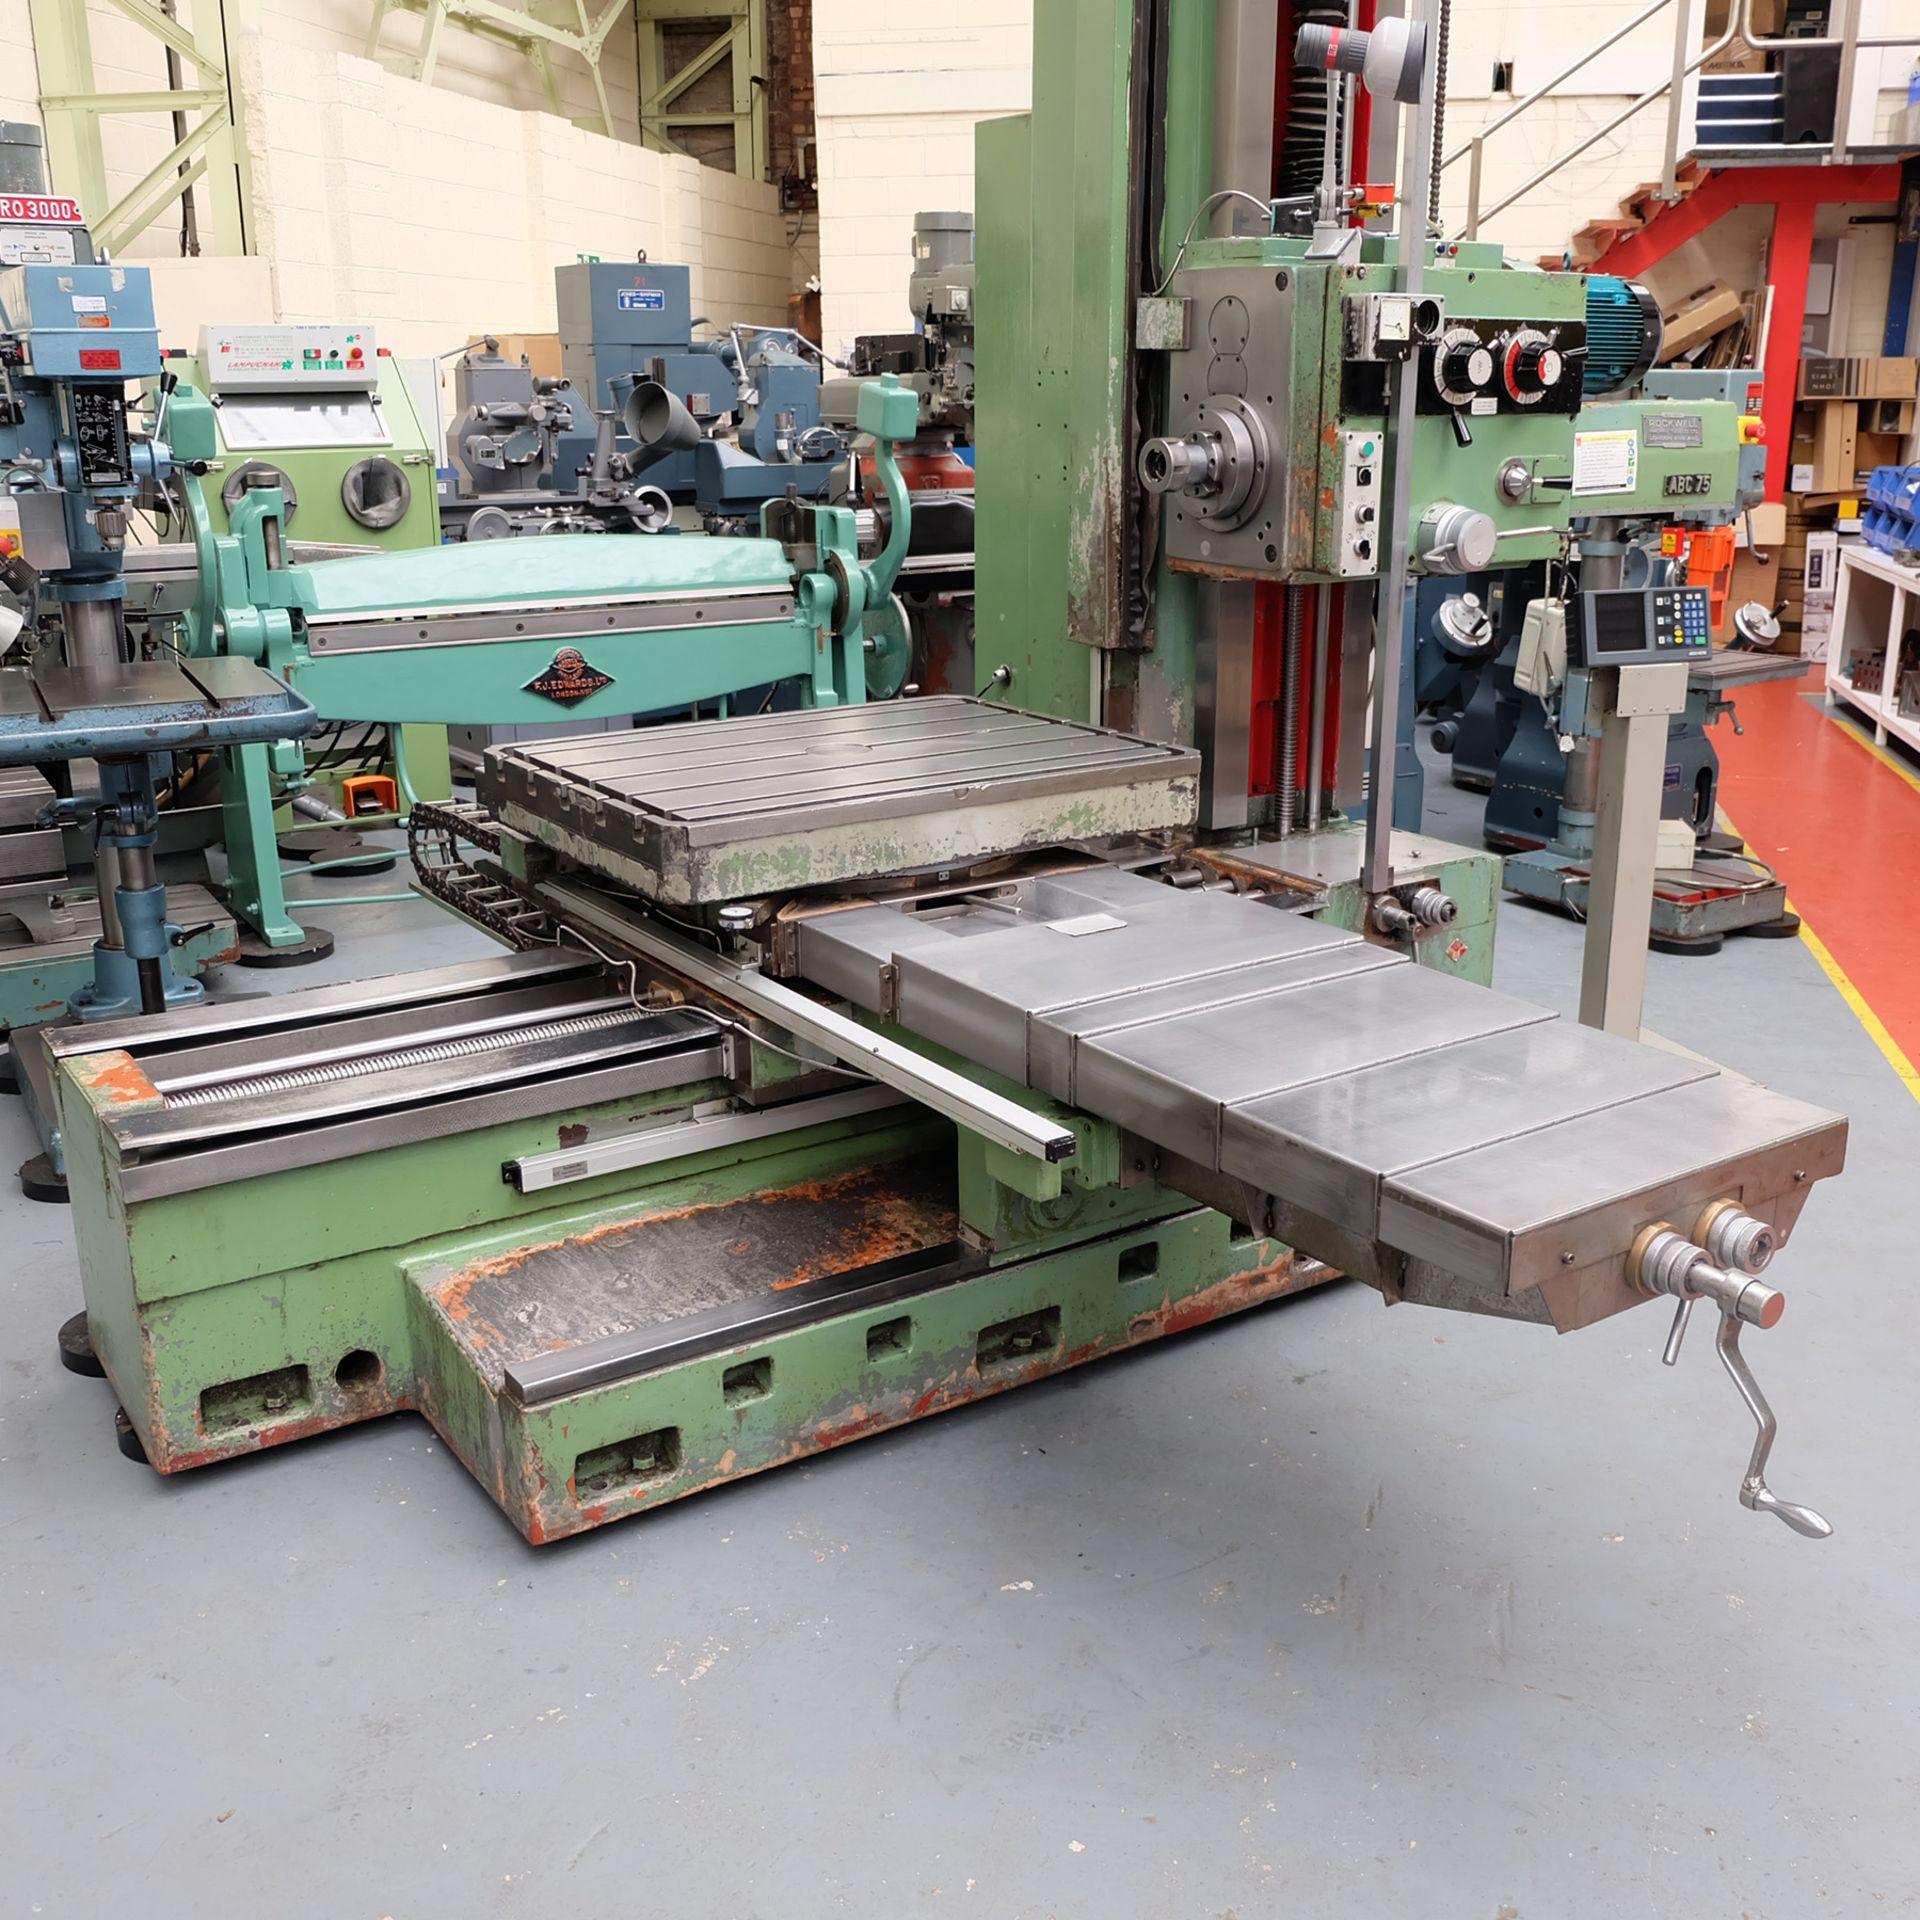 Lot 1 - Ceruti Model ABC 75 Horizontal Boring & Milling Machine. With Tooling.